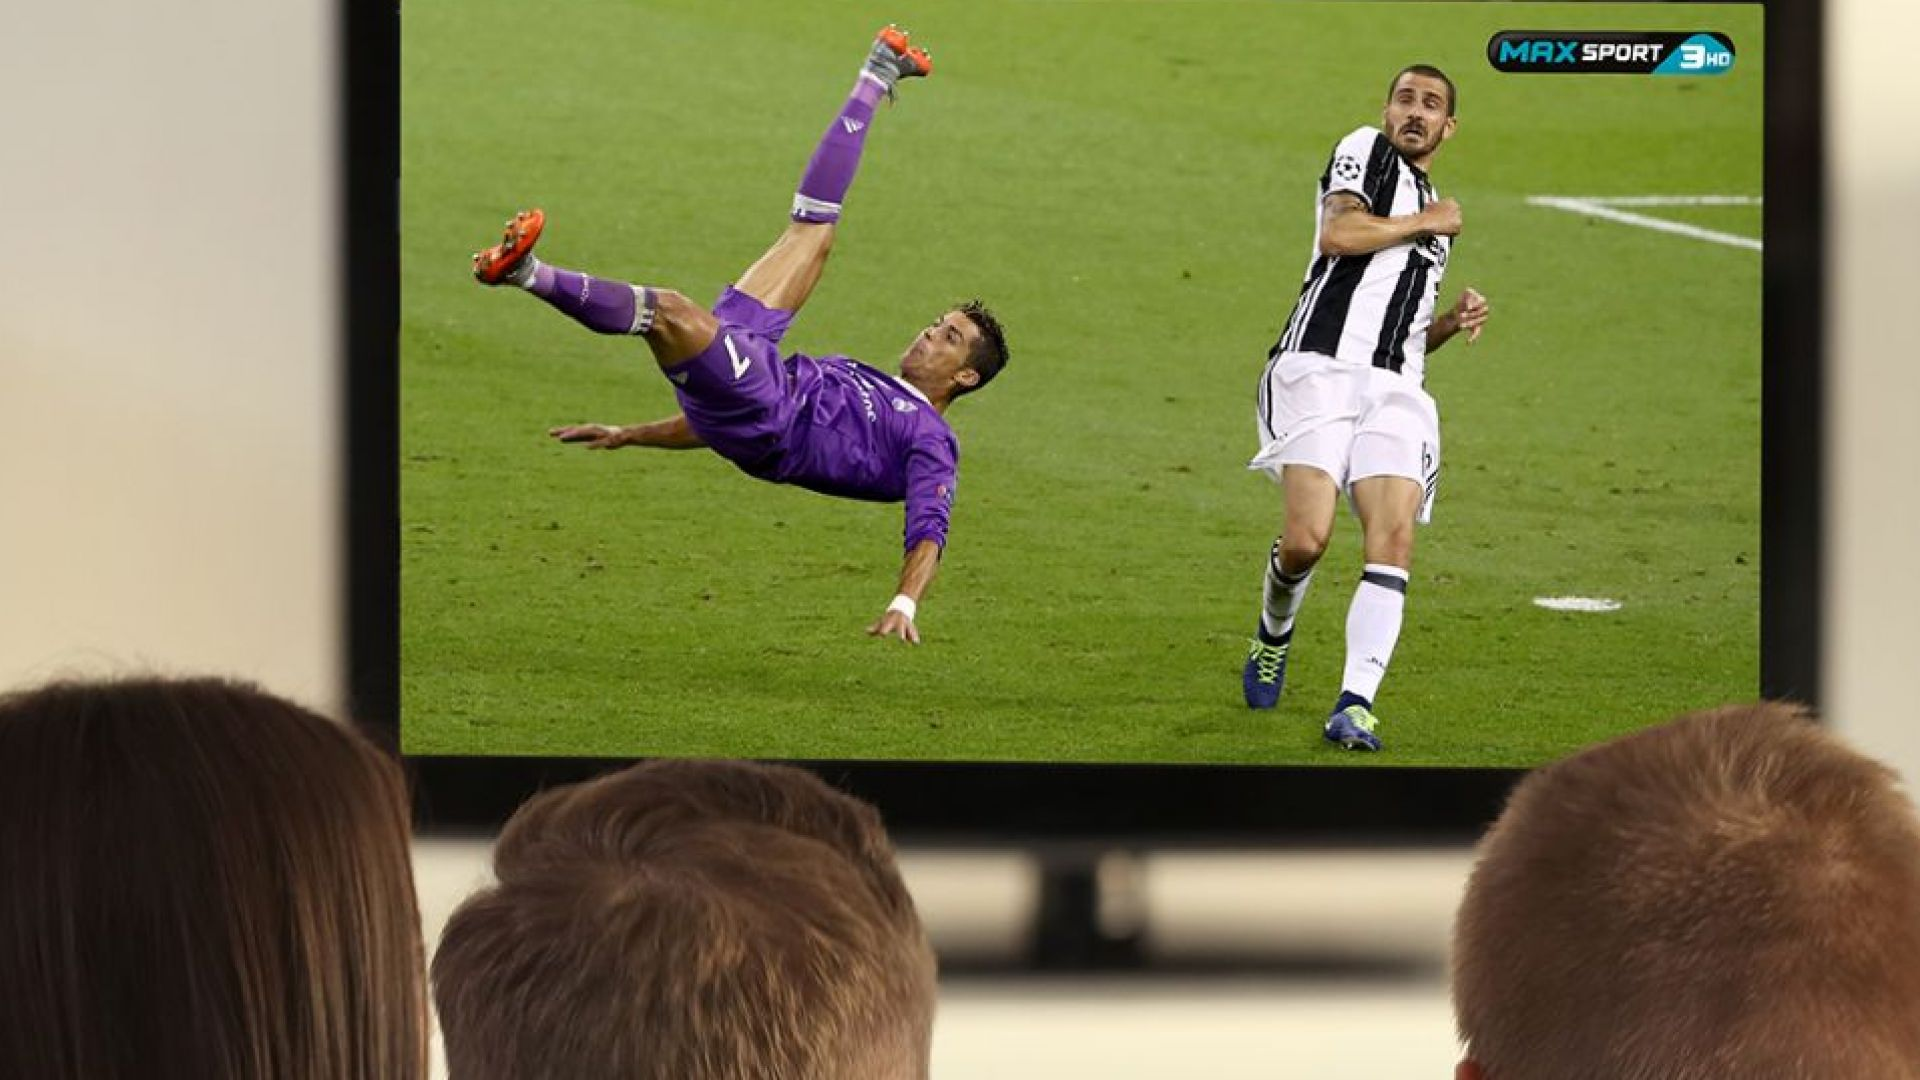 A1 стартира трети спортен канал